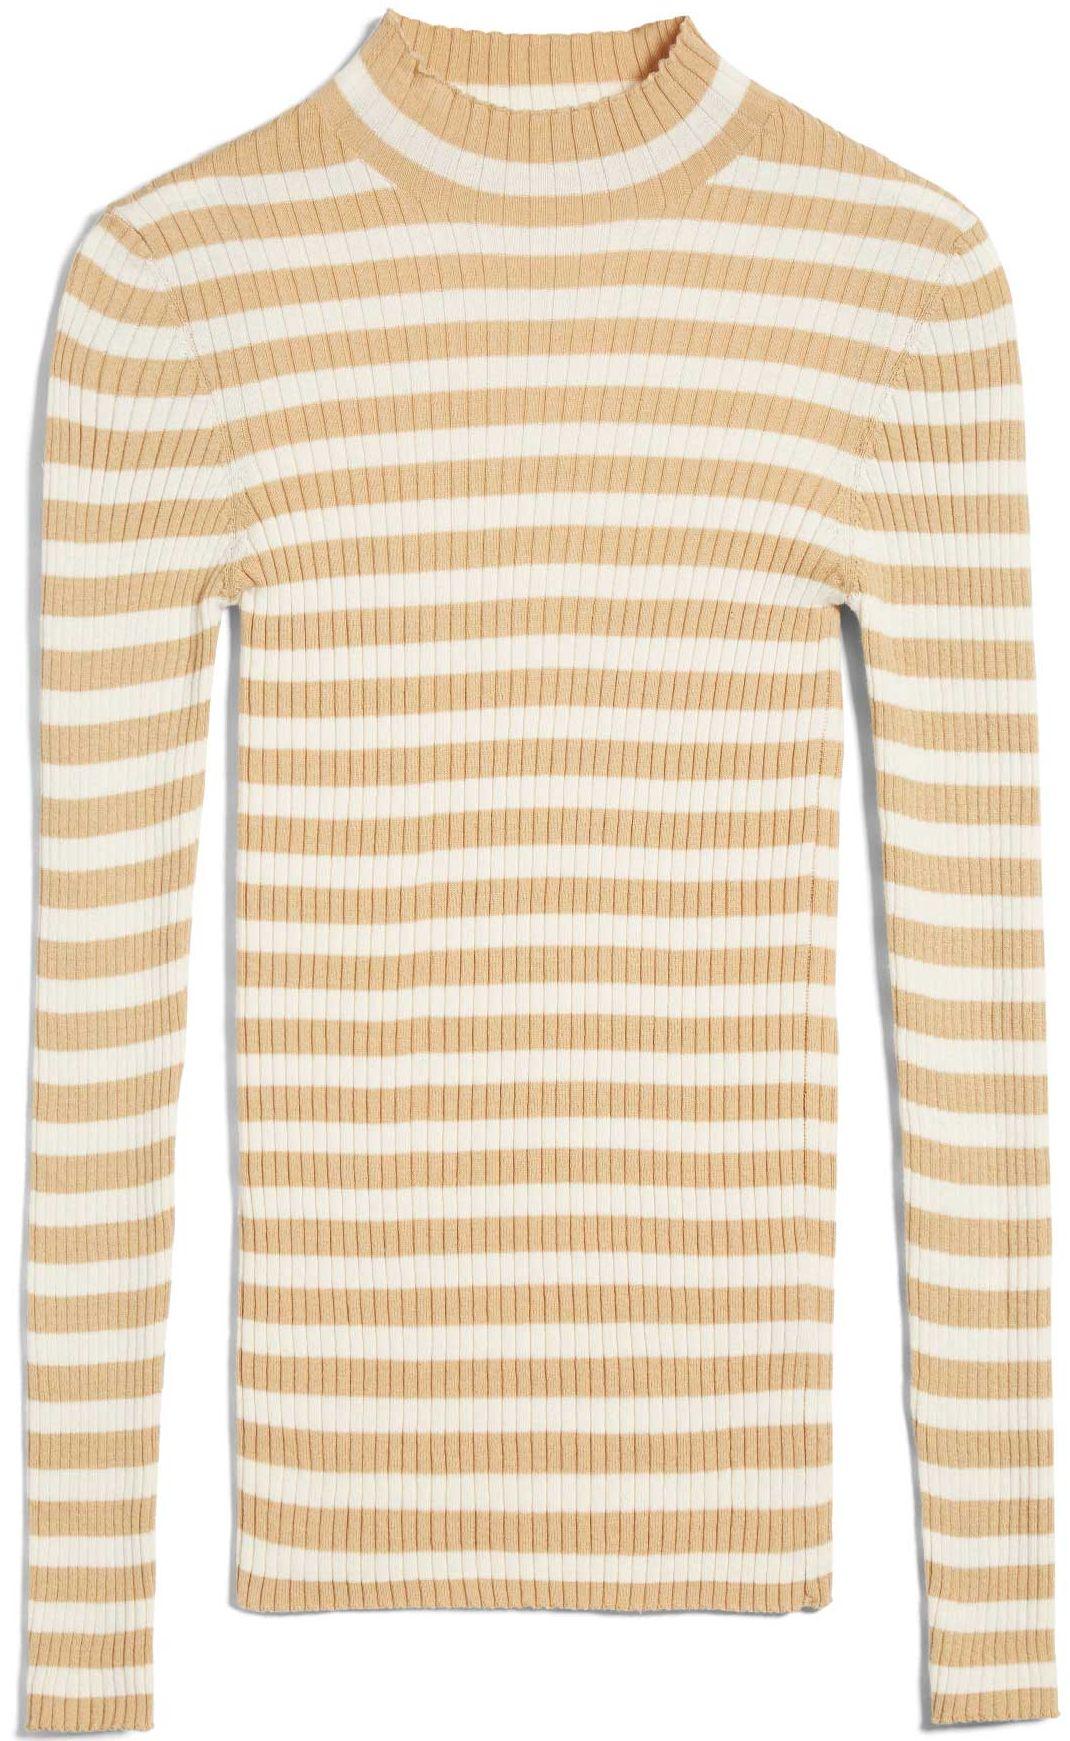 Damen-Pullover ALAANI STRIPED golden harvest/ oatmilk